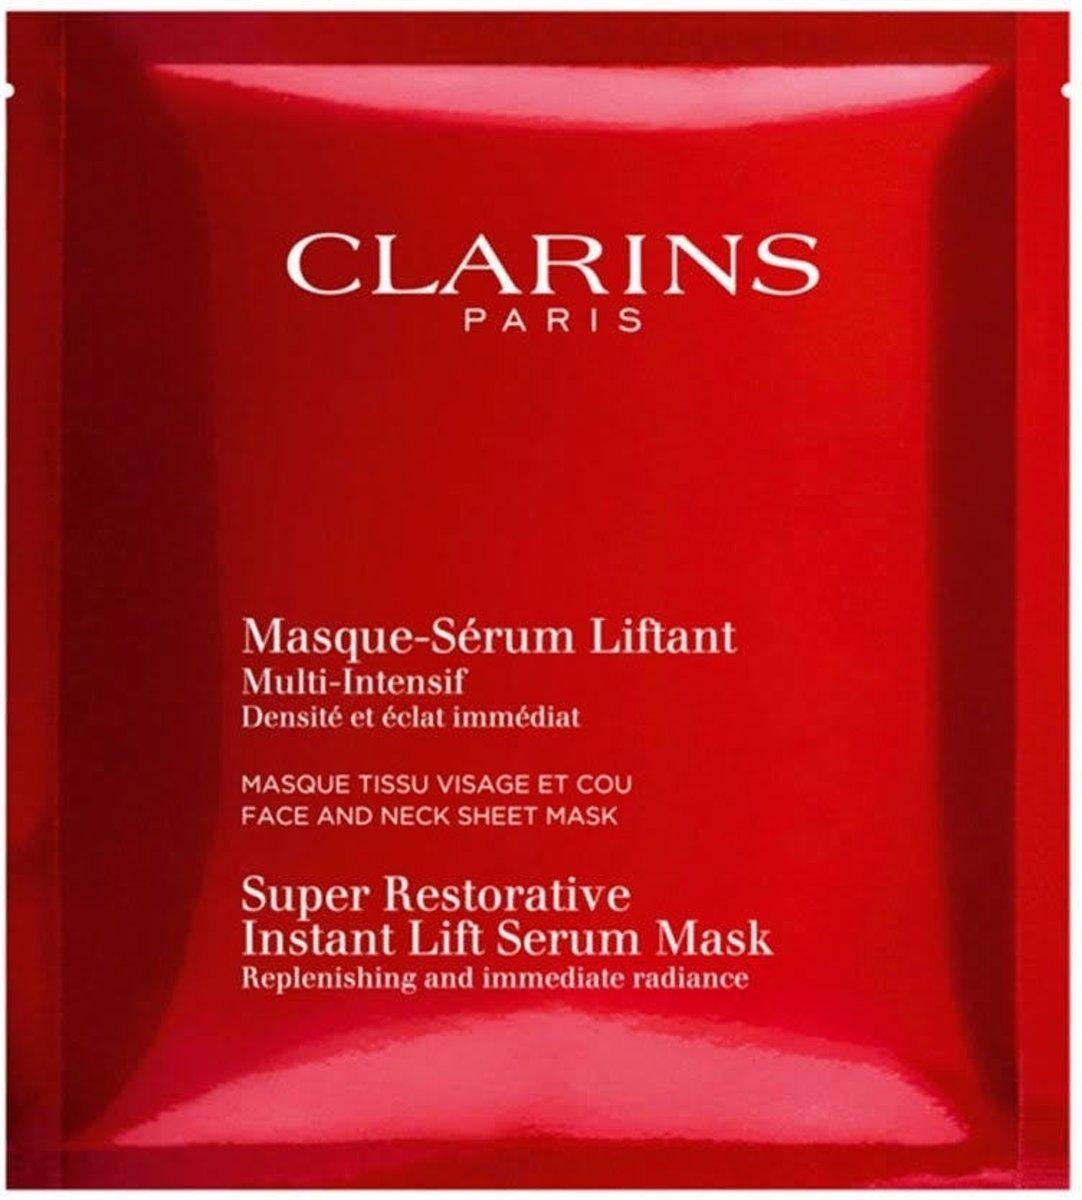 Clarins Multi-Intensive Masque-S?rum Liftant Masker - 5 stuks - Gezichtsmasker